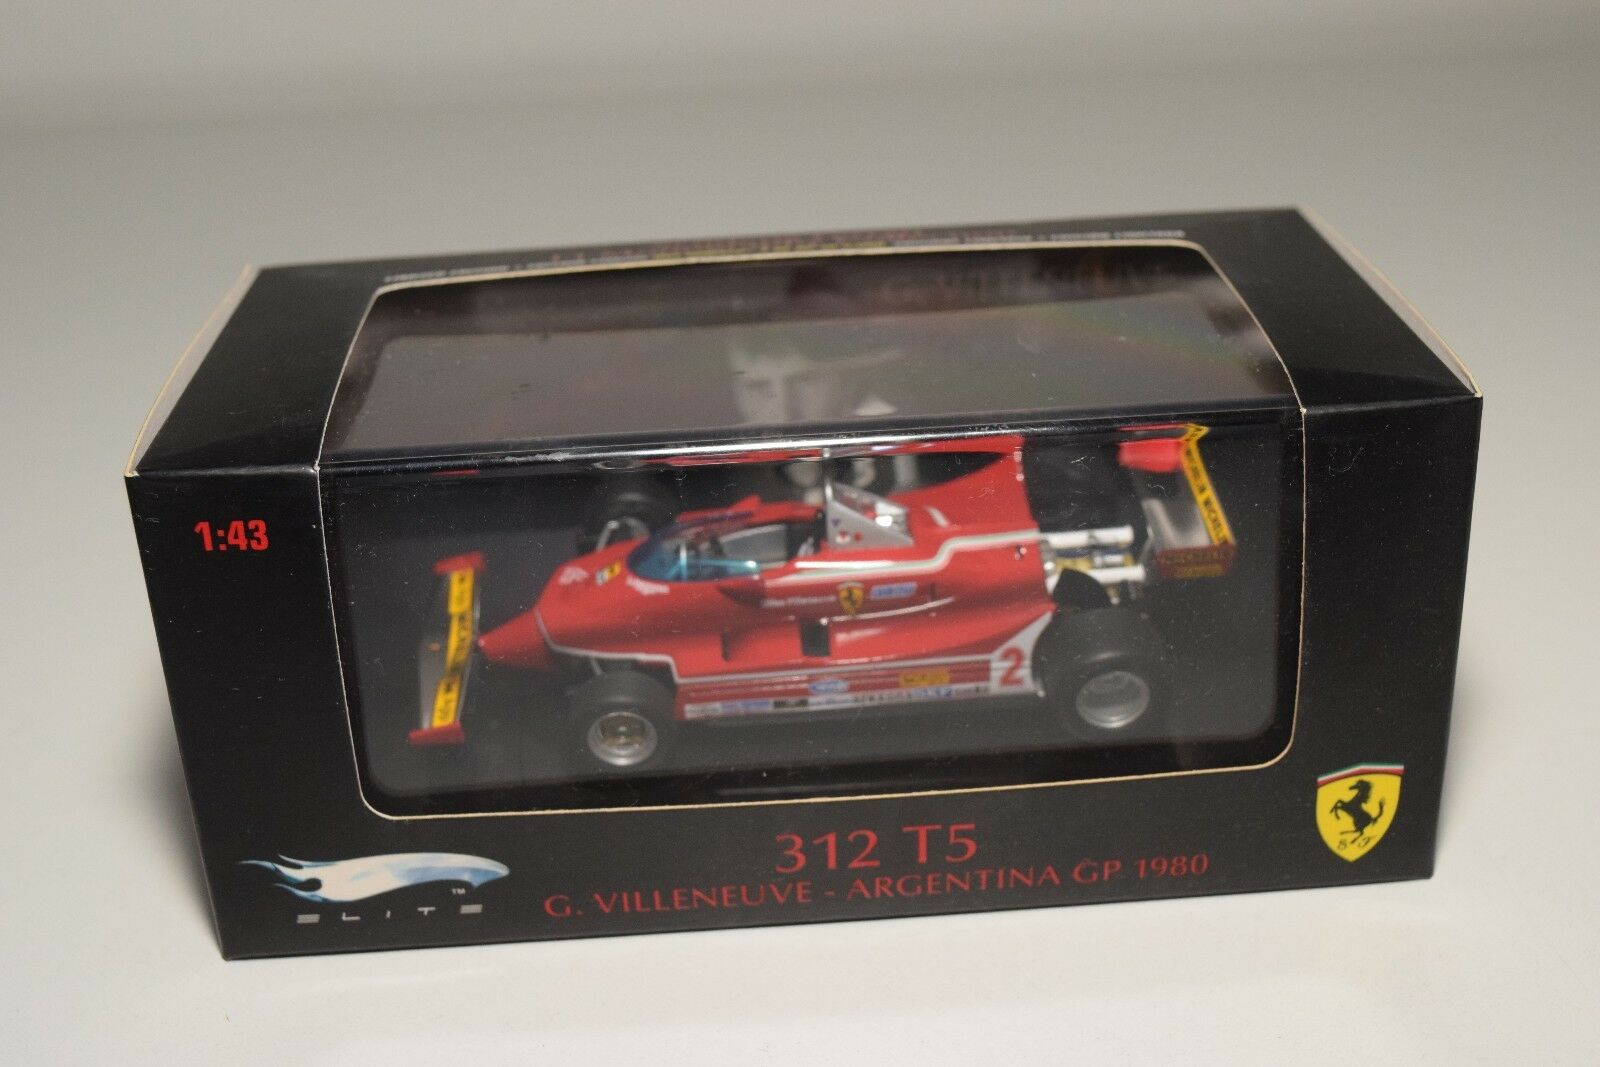 V 1 43 HOTWHEELS FERRARI 312 T5 VILLENEUVE GP argentoINA 1980 MINT BOXED